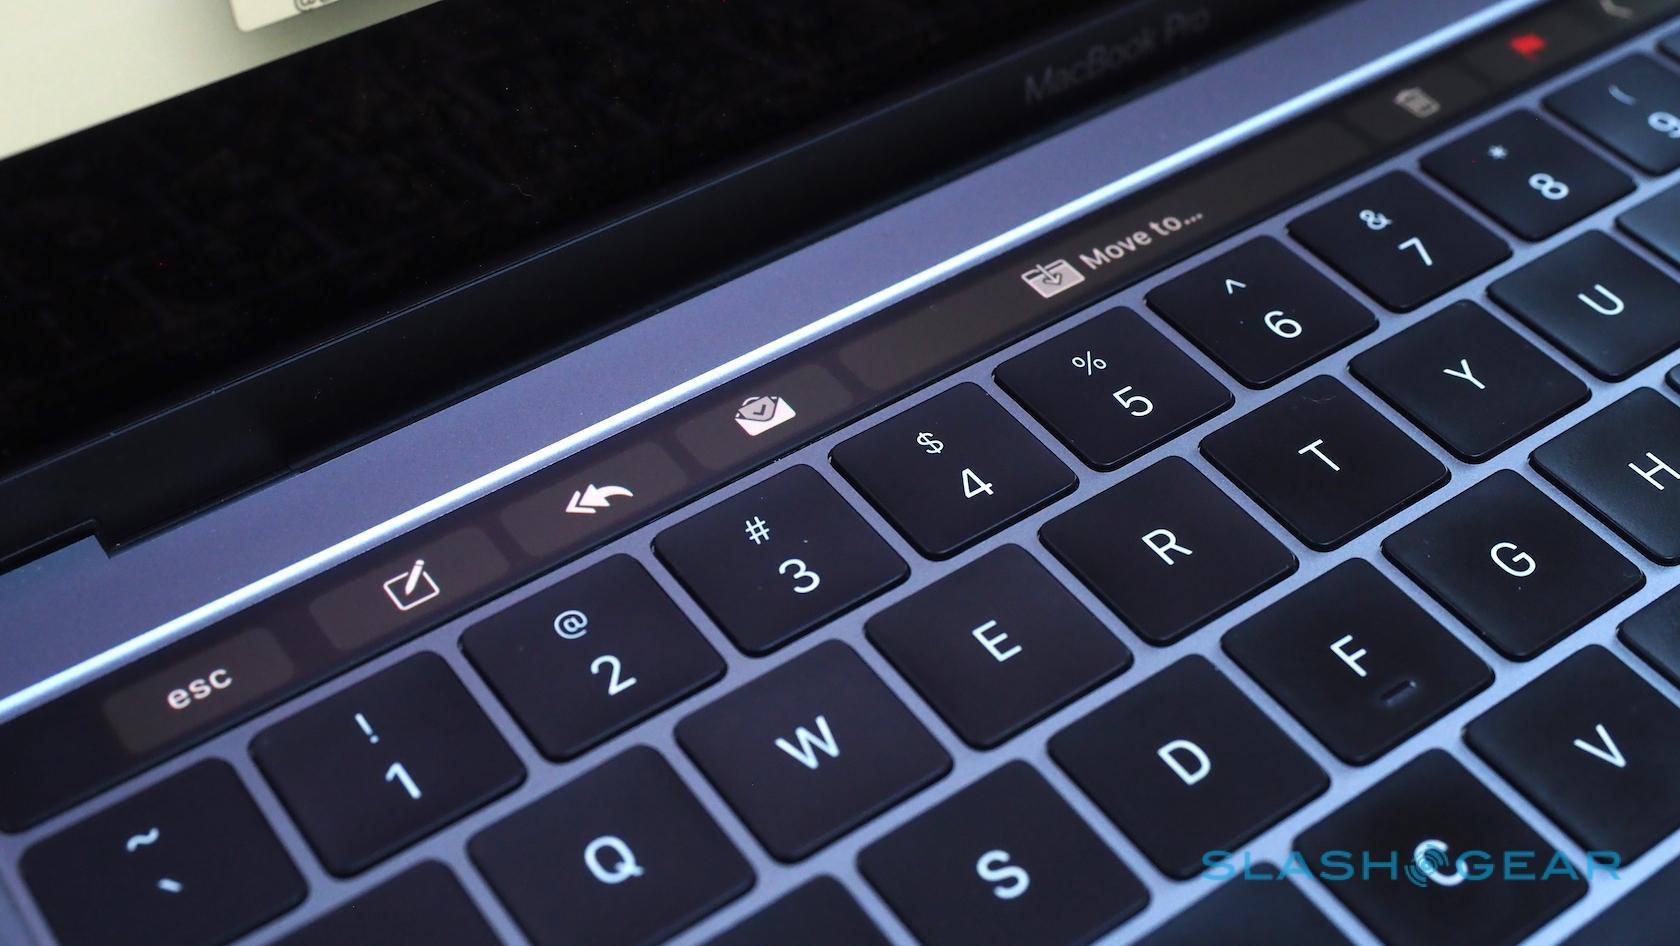 Apple's Touch Bar needs to grow up - SlashGear